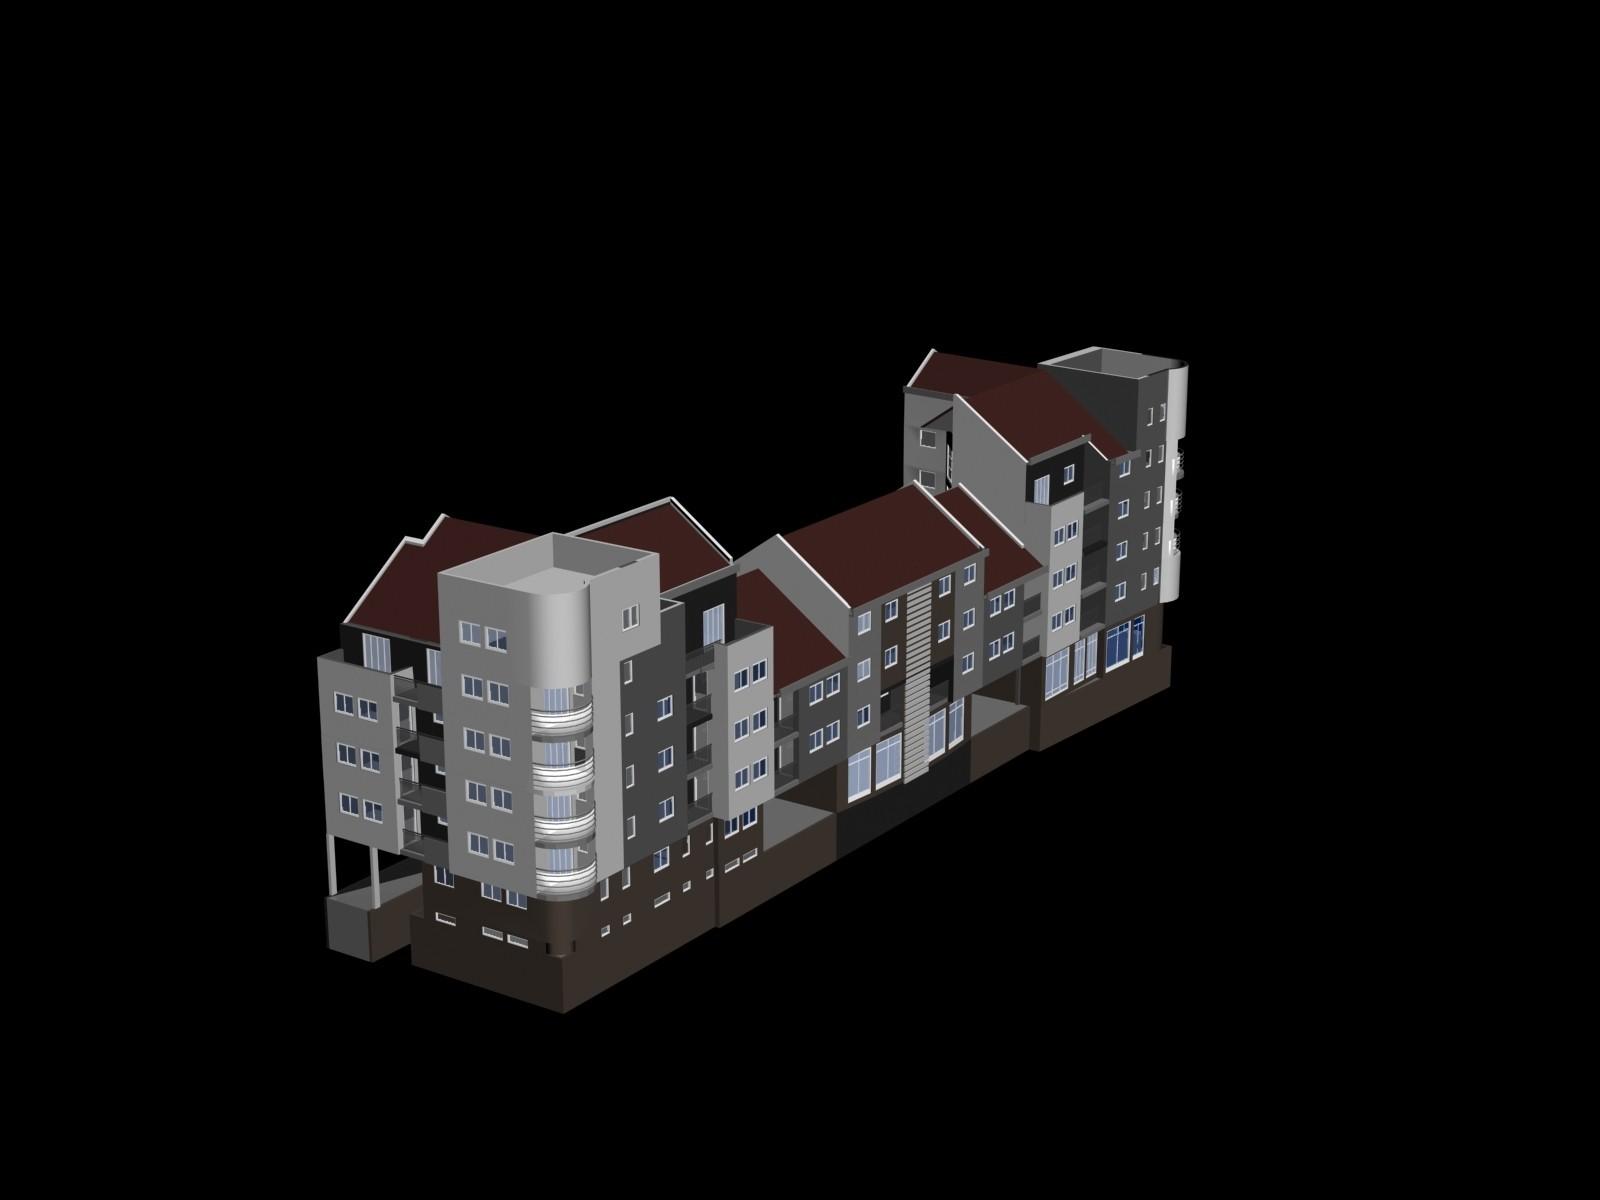 1.jpg Download free STL file Building complex • 3D printer design, Zorana